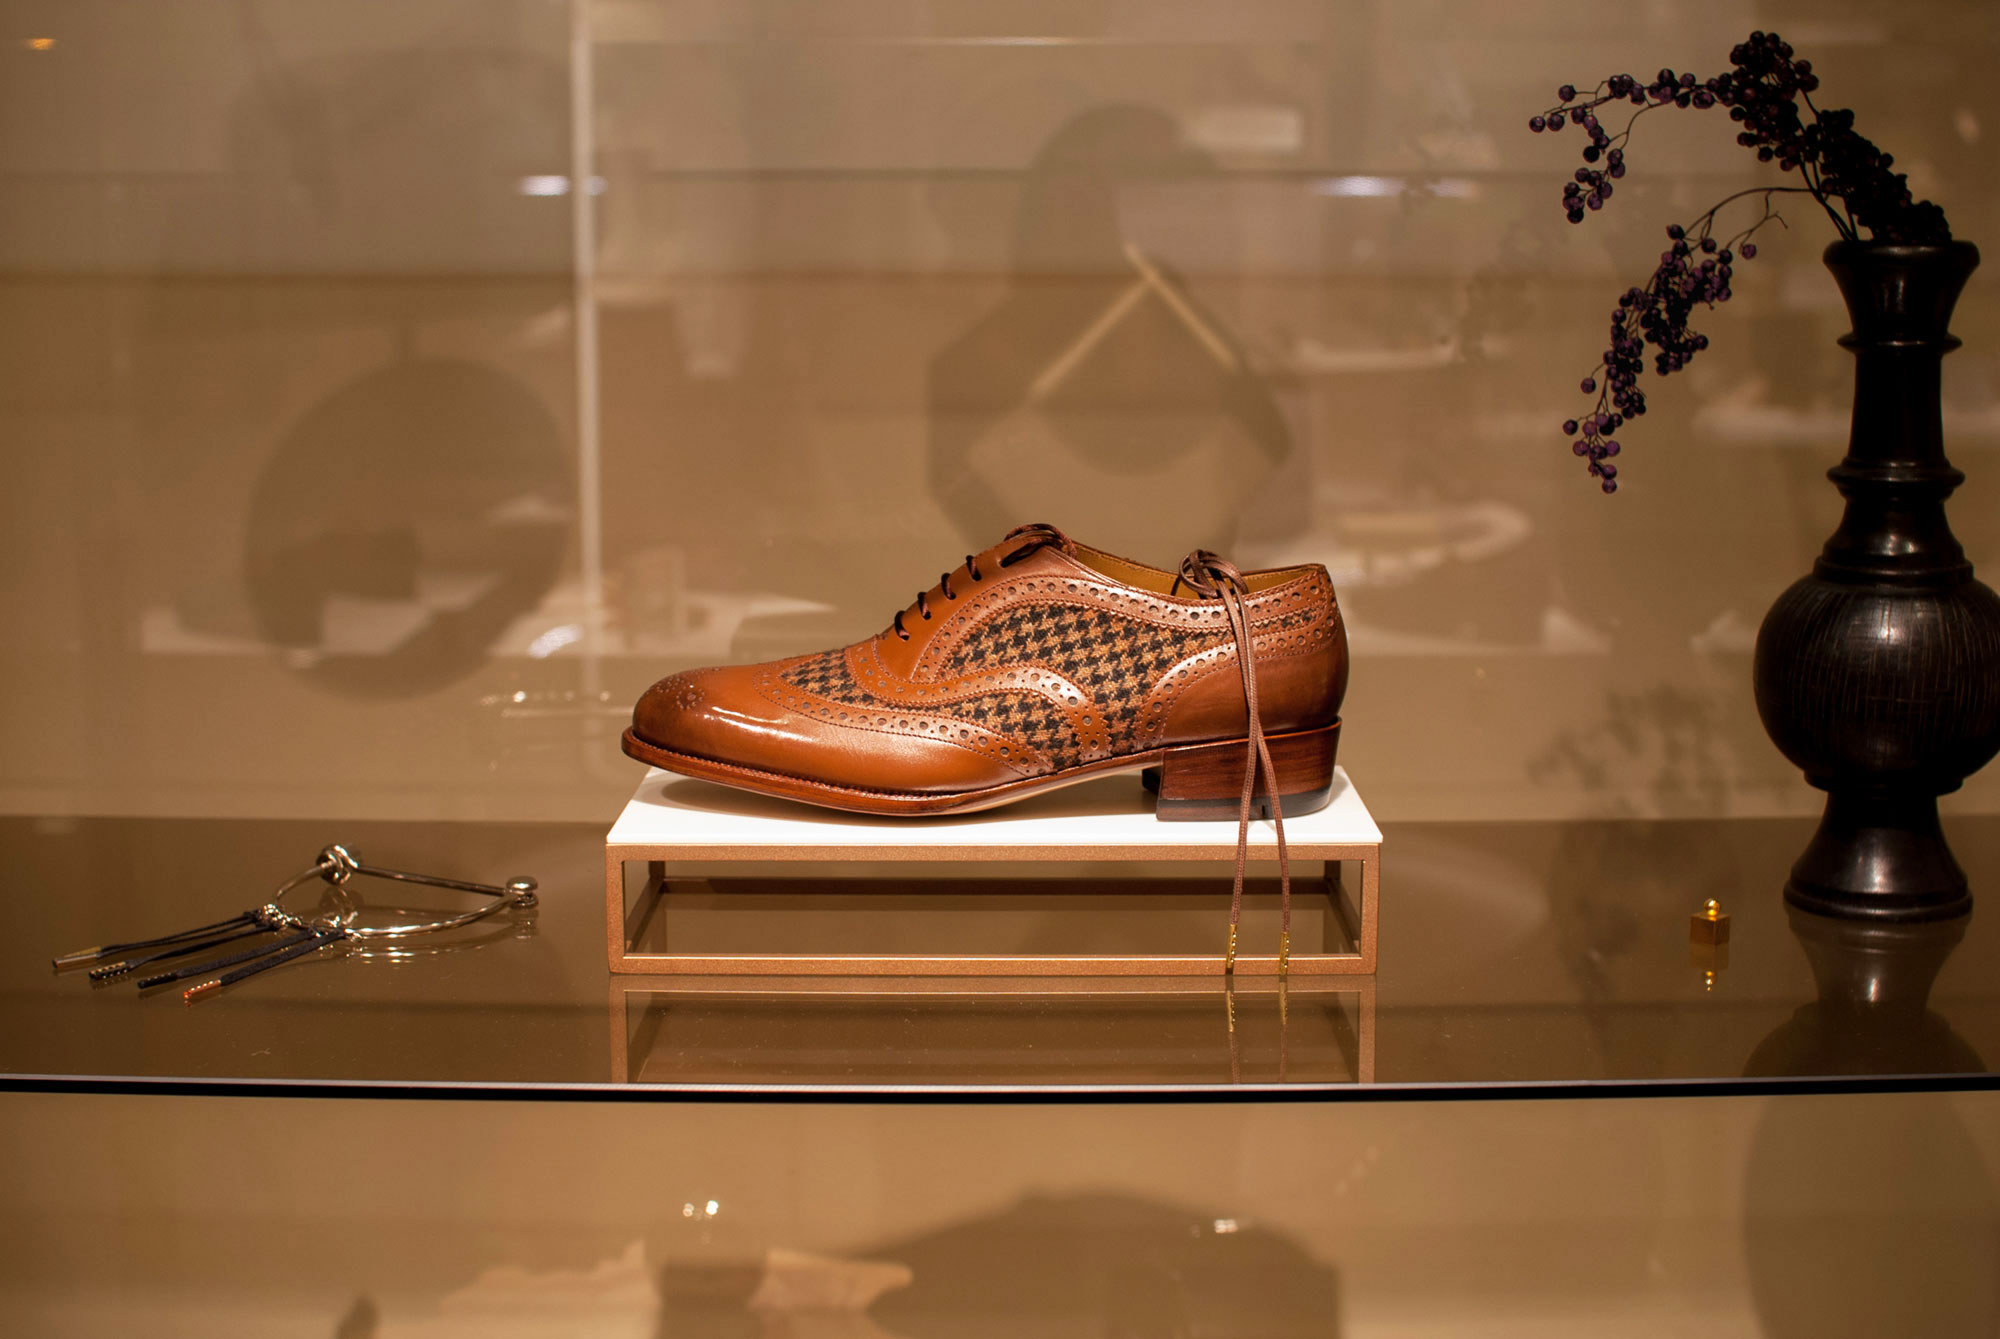 yojiomi 革靴 ハンドメイド